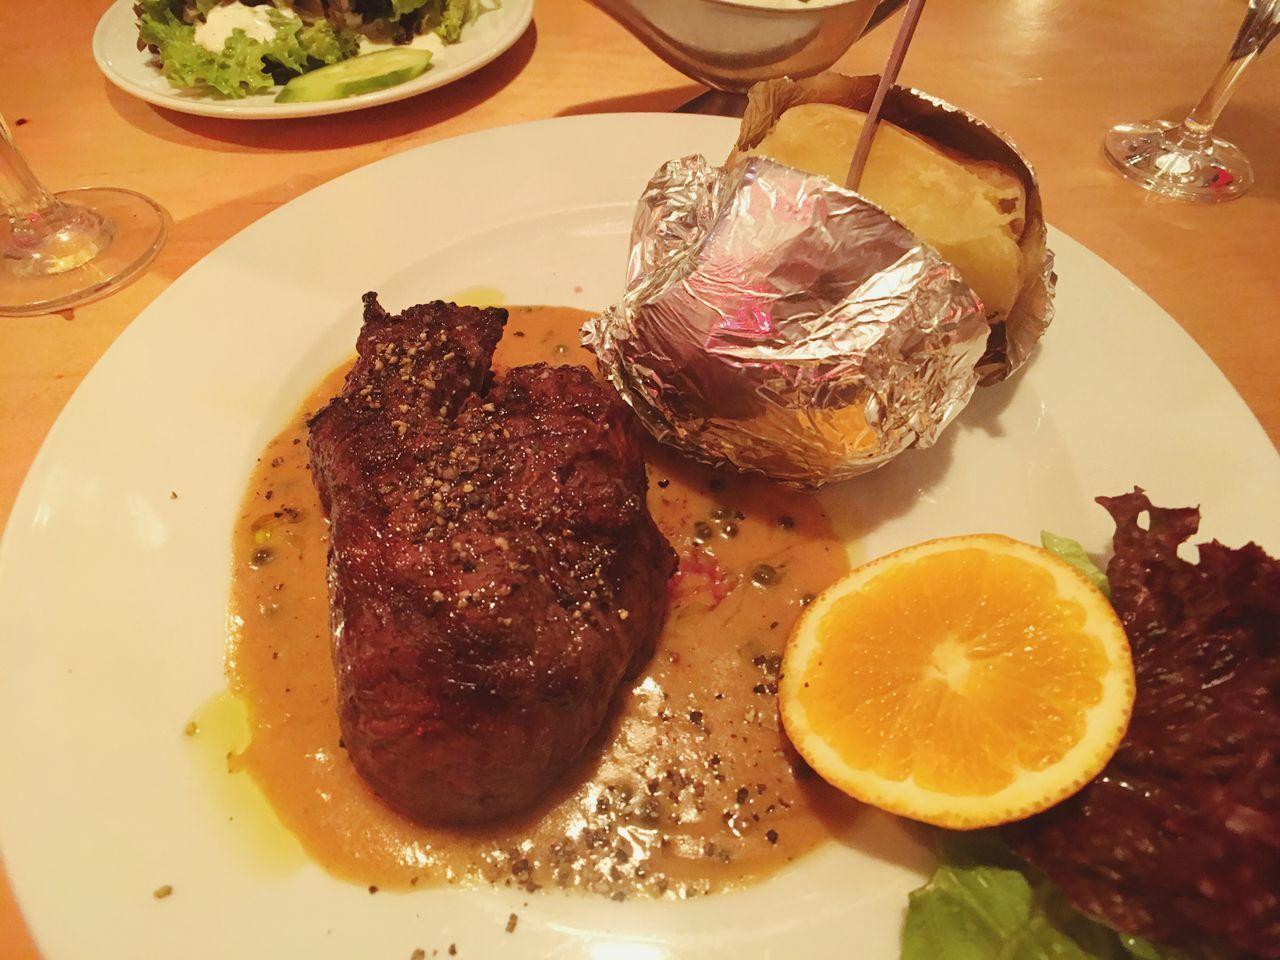 Steak and potato Food Food And Drink Ready-to-eat No People Steaks Steak Meat Fleisch Potato Jacket Potato Baked Potato